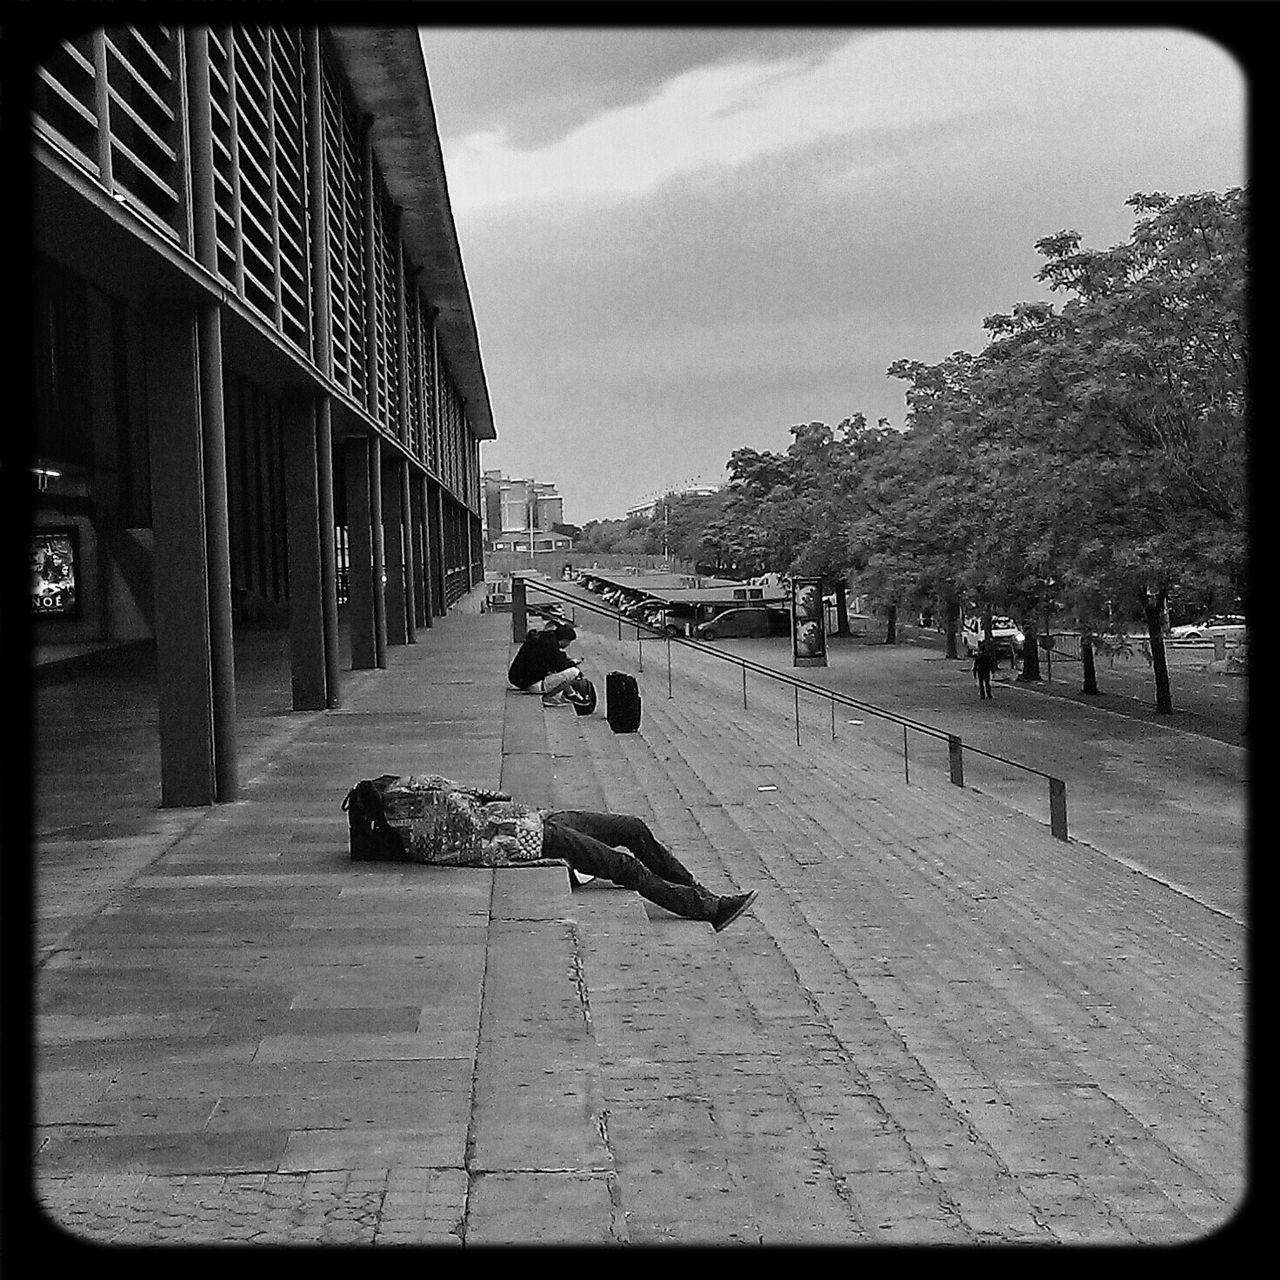 Street Street Photography Streetphoto_bw Streetphotography_bw Una siesta matinal